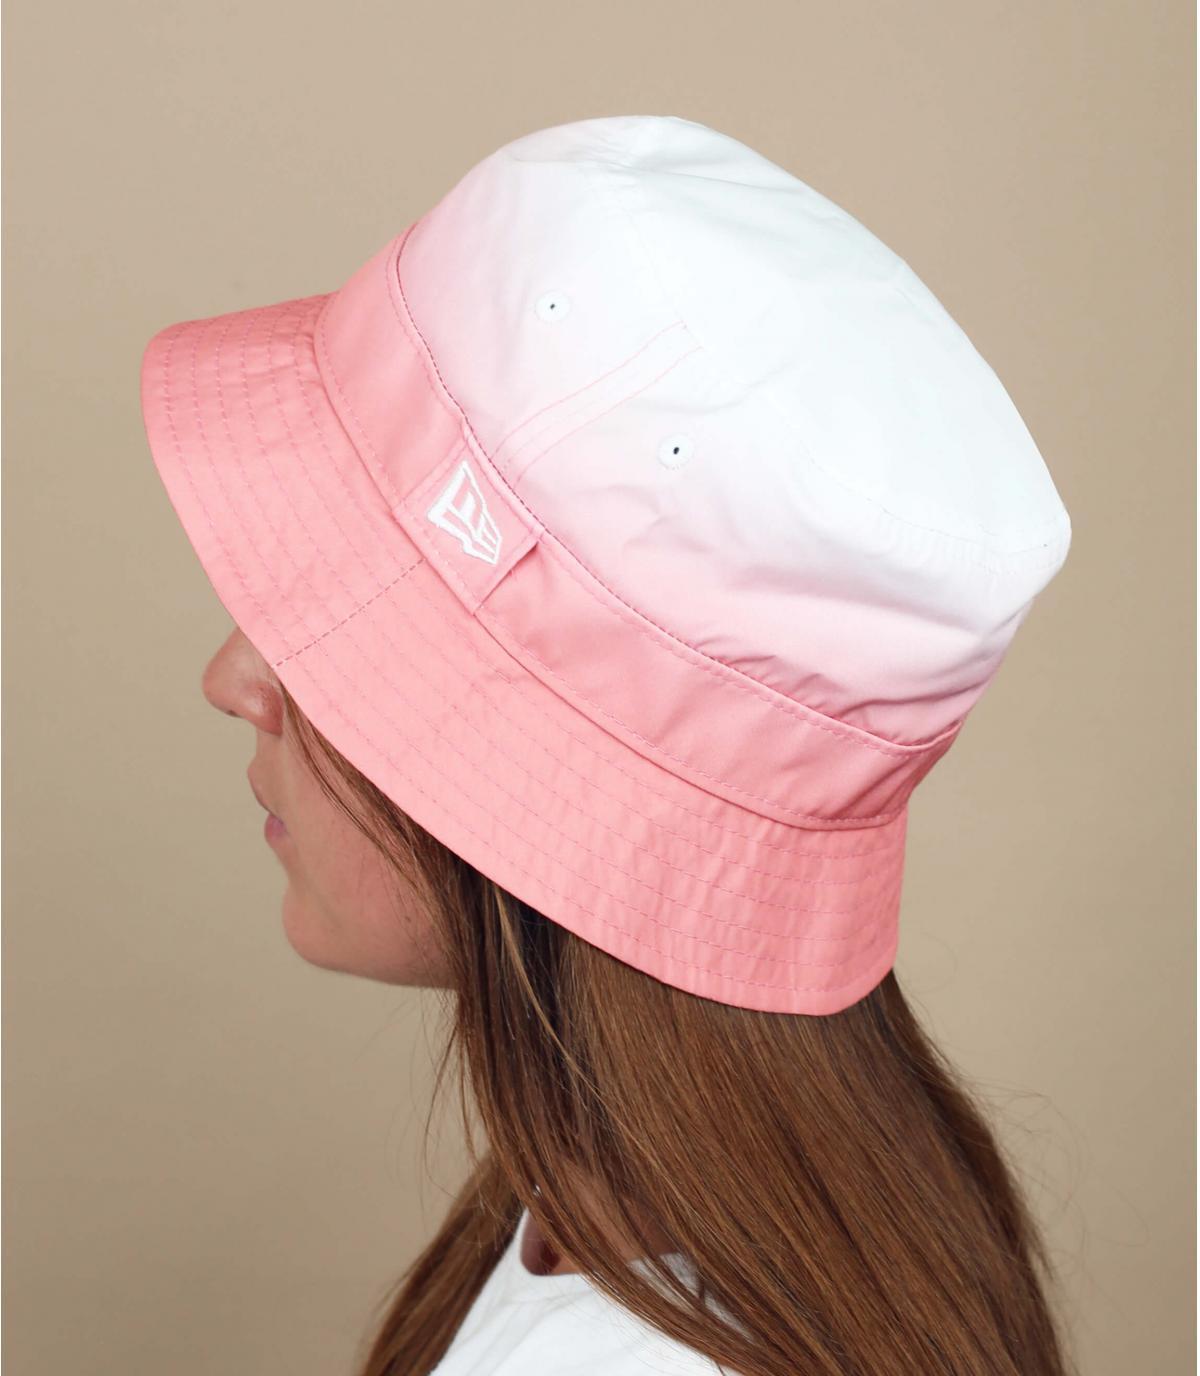 Fischerhut rosa abgestuft New Era